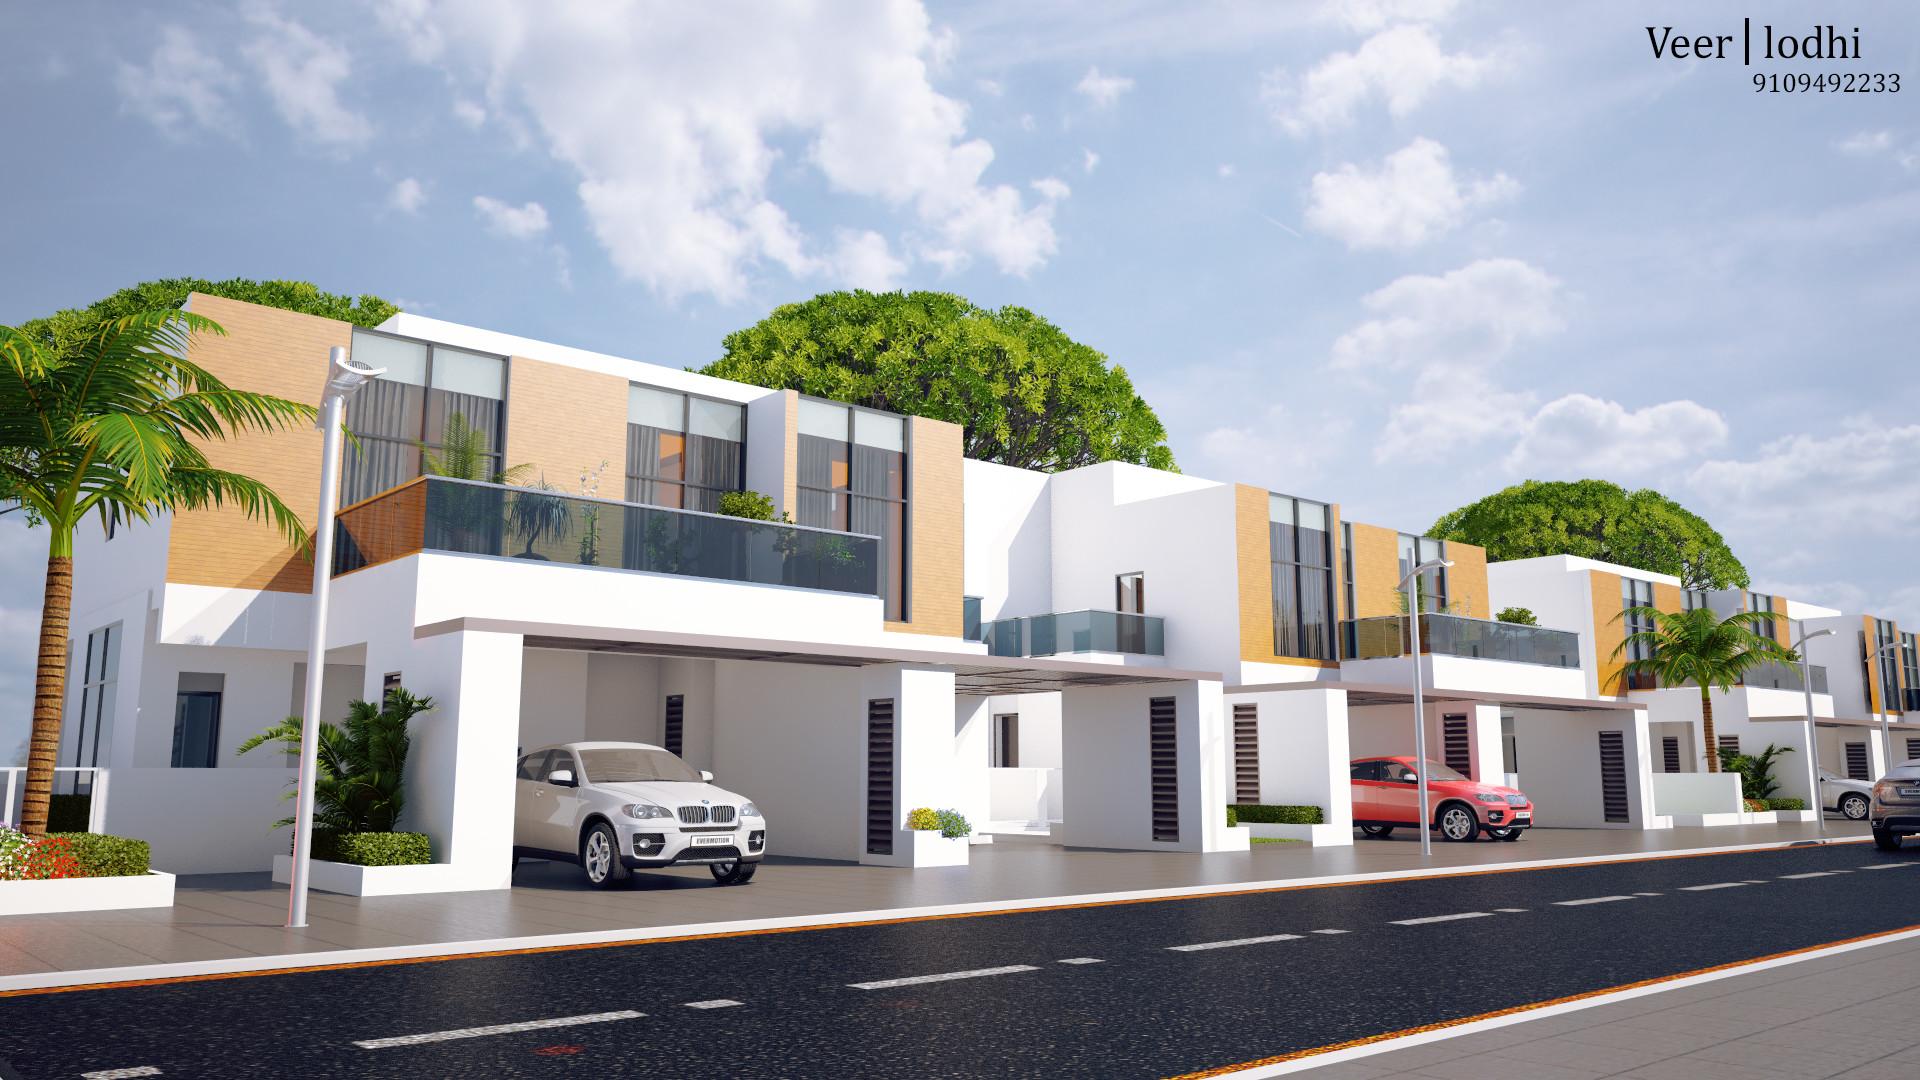 Artstation 3d Photorealistic Rendering 3d Architectural Walkthrough 3d Interior Designing Veer Lodhi